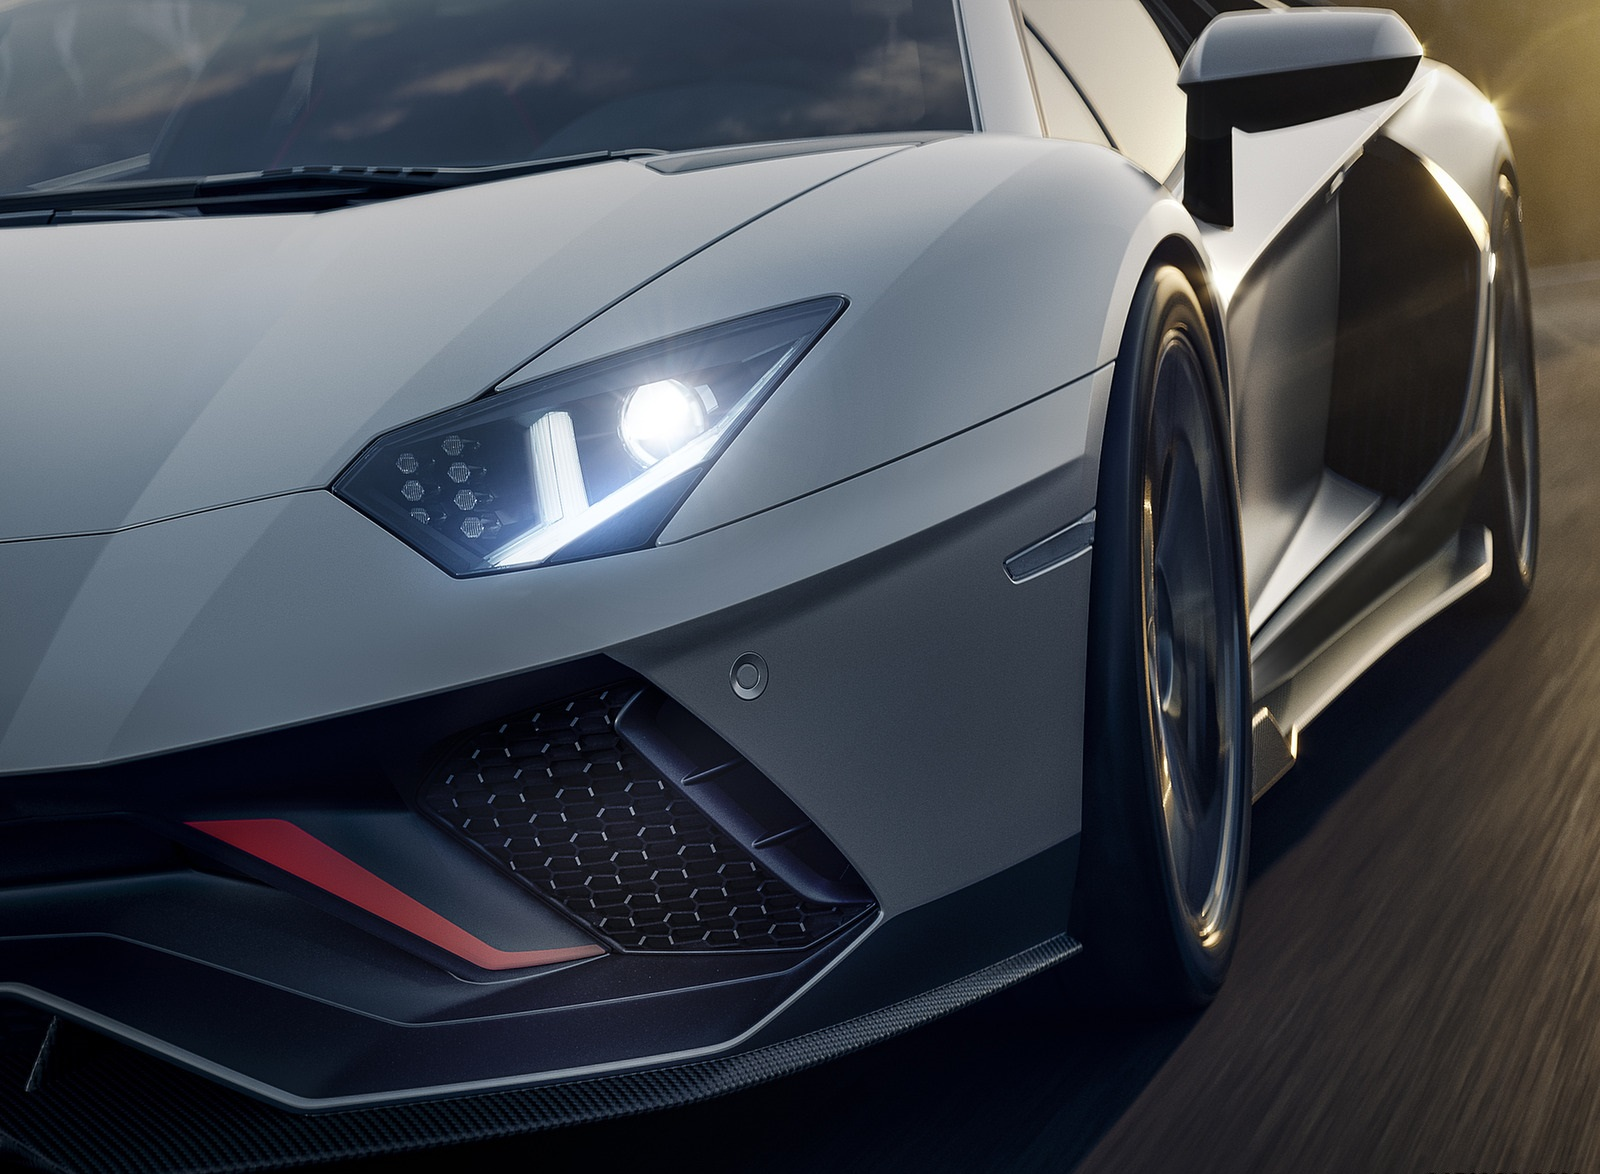 2022 Lamborghini Aventador LP 780-4 Ultimae Headlight Wallpapers (8)